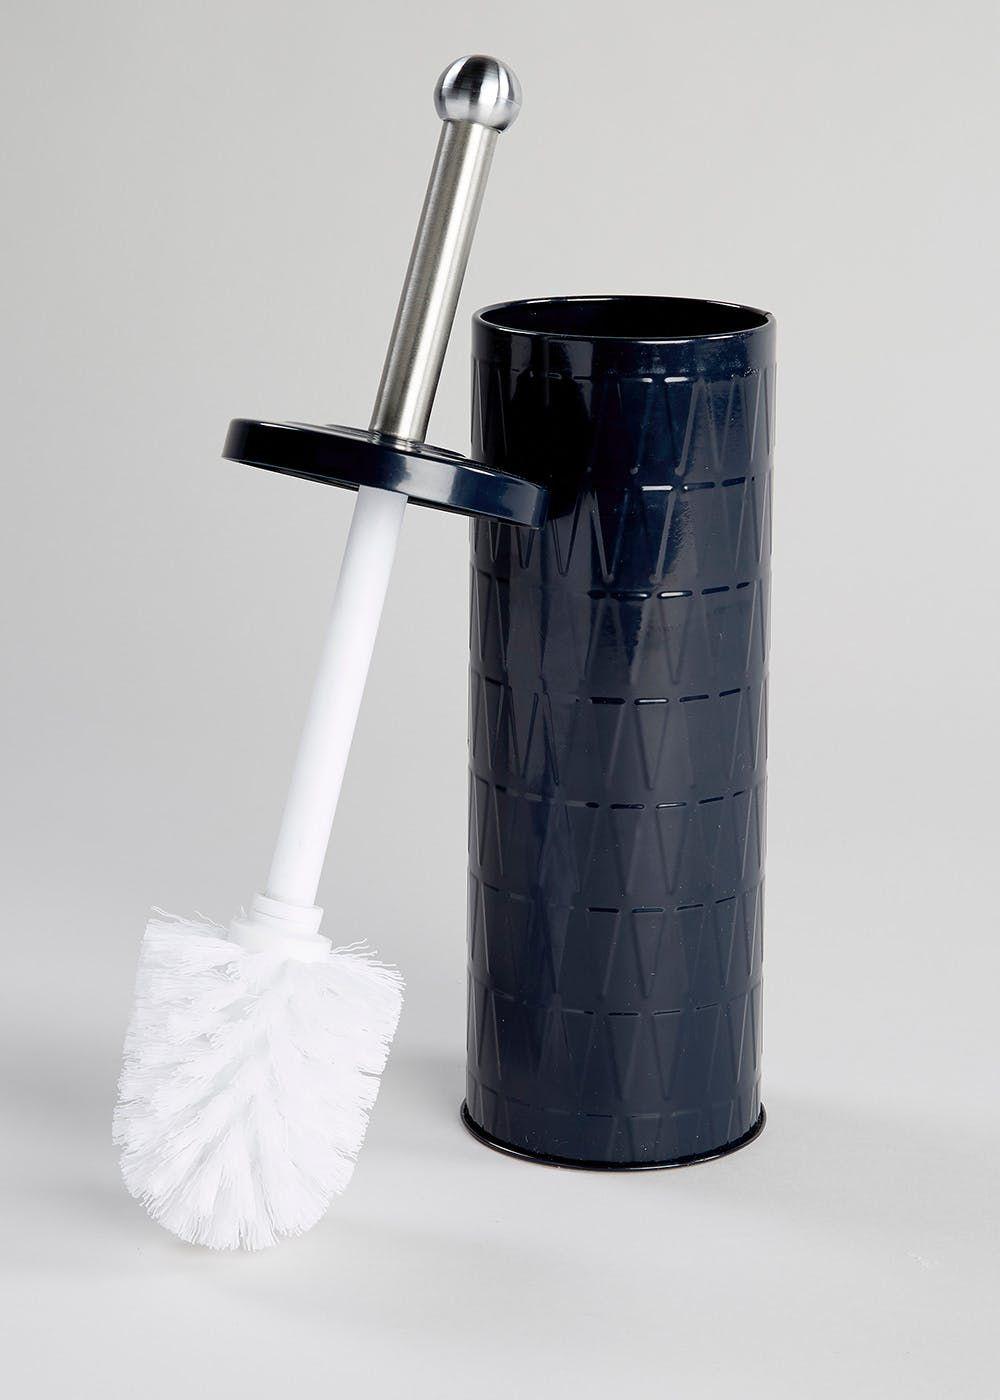 Retro Style Toilet Brush 19cm x 6cm